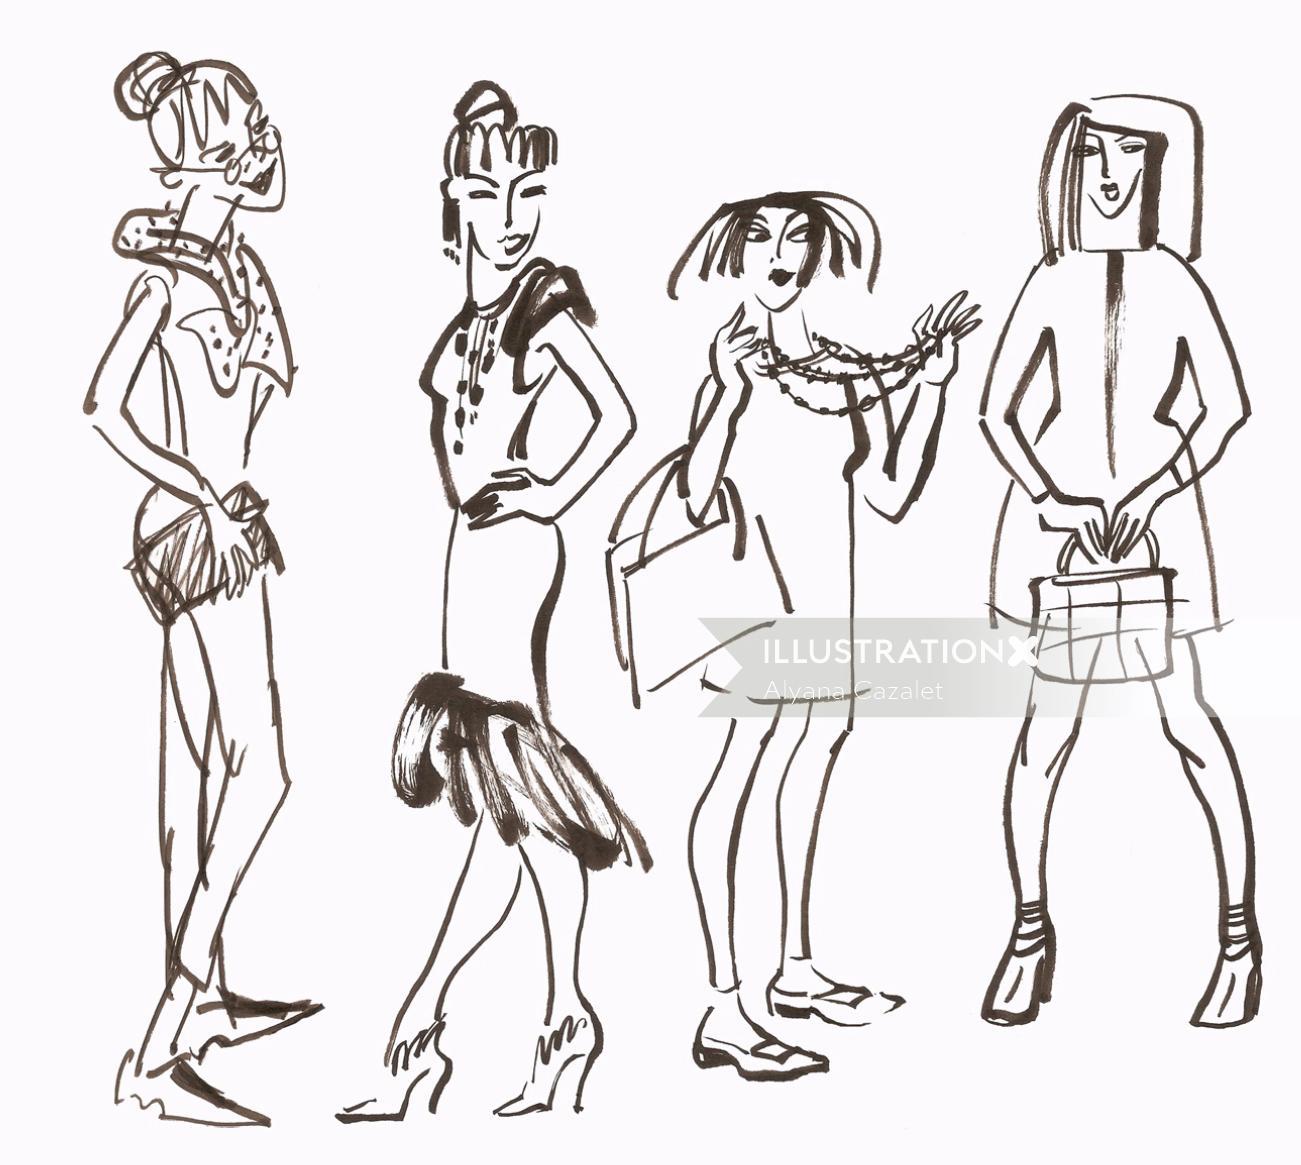 Group of ladies illustration by Alyana Cazalet